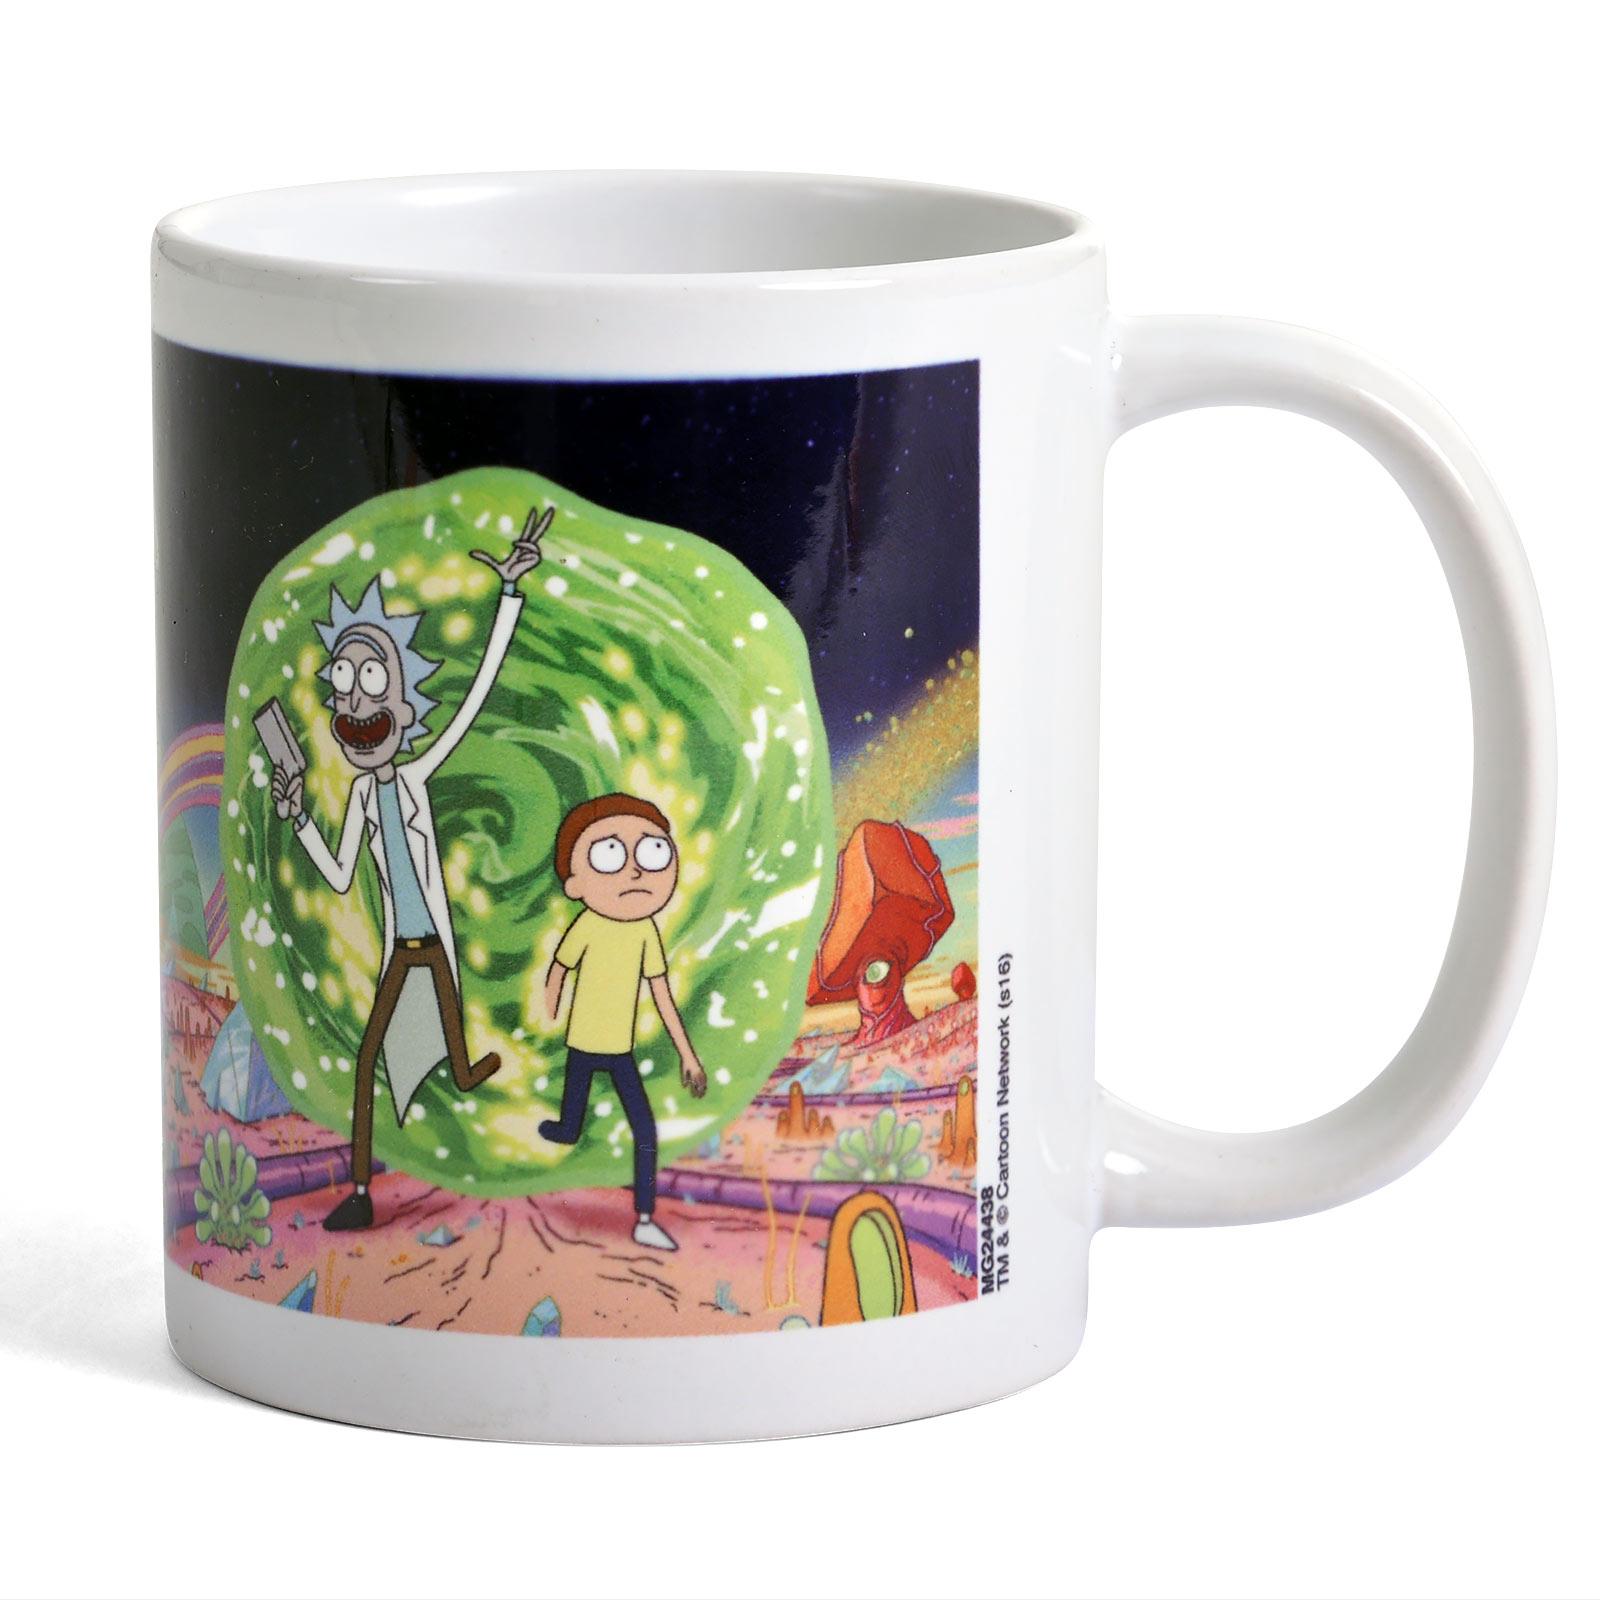 Rick and Morty - Portal Tasse